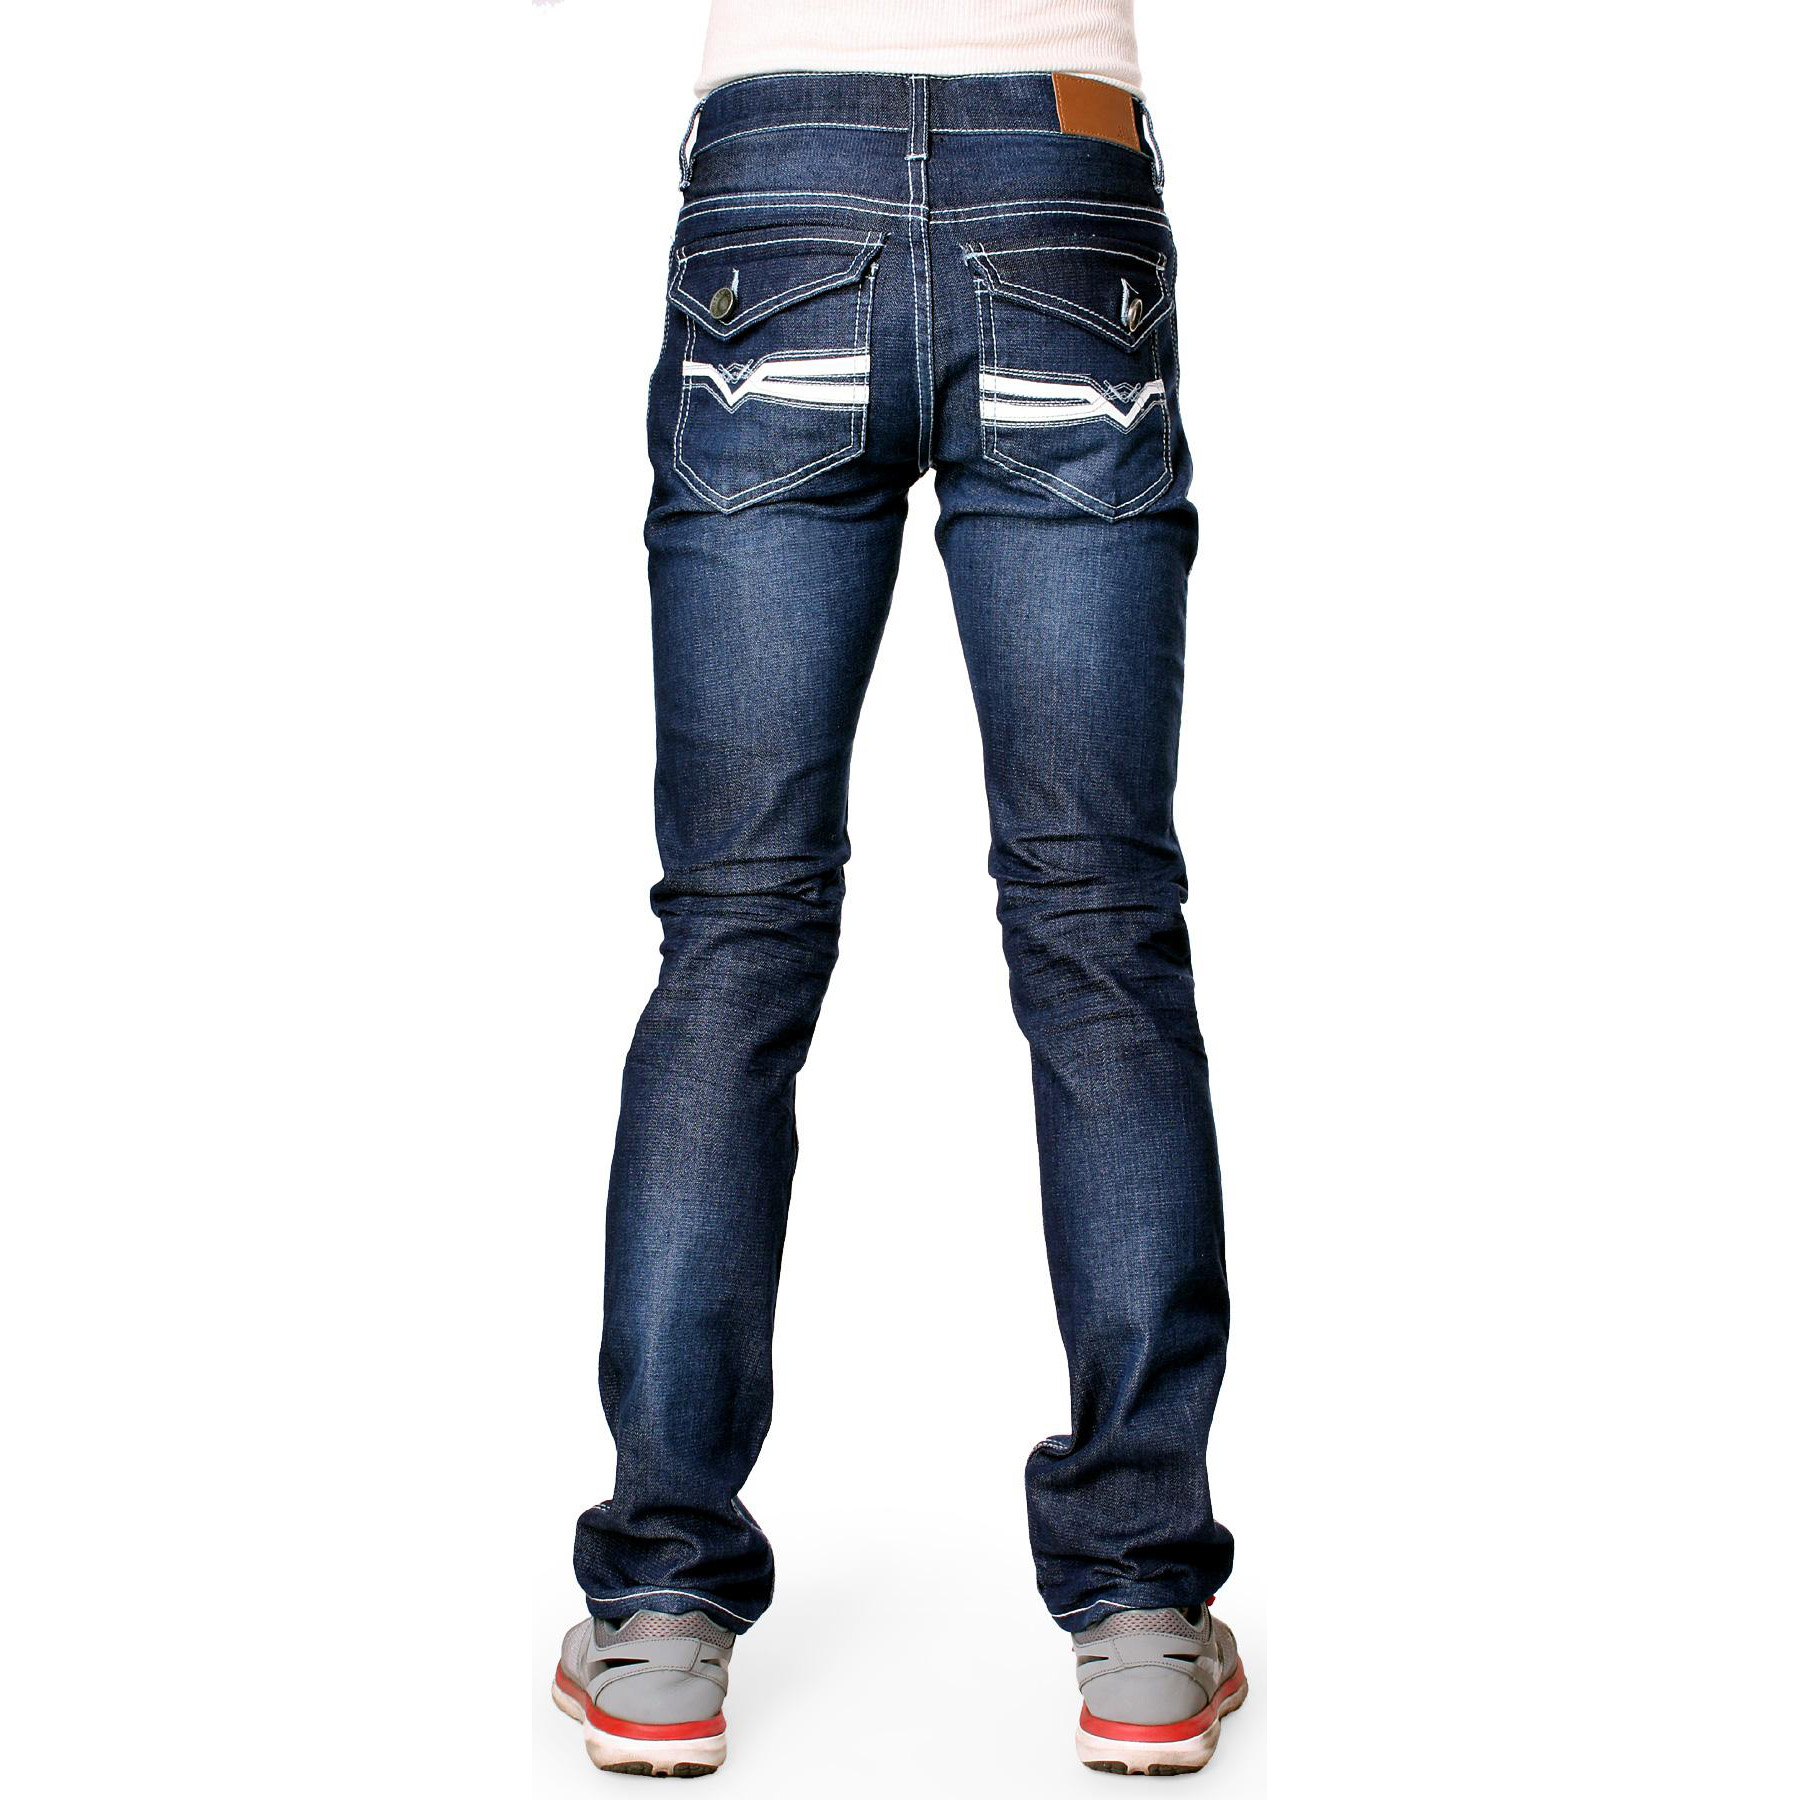 626 Denim Designer Fashion Mens Slim Fit Skinny Jeans - Multiple Styles